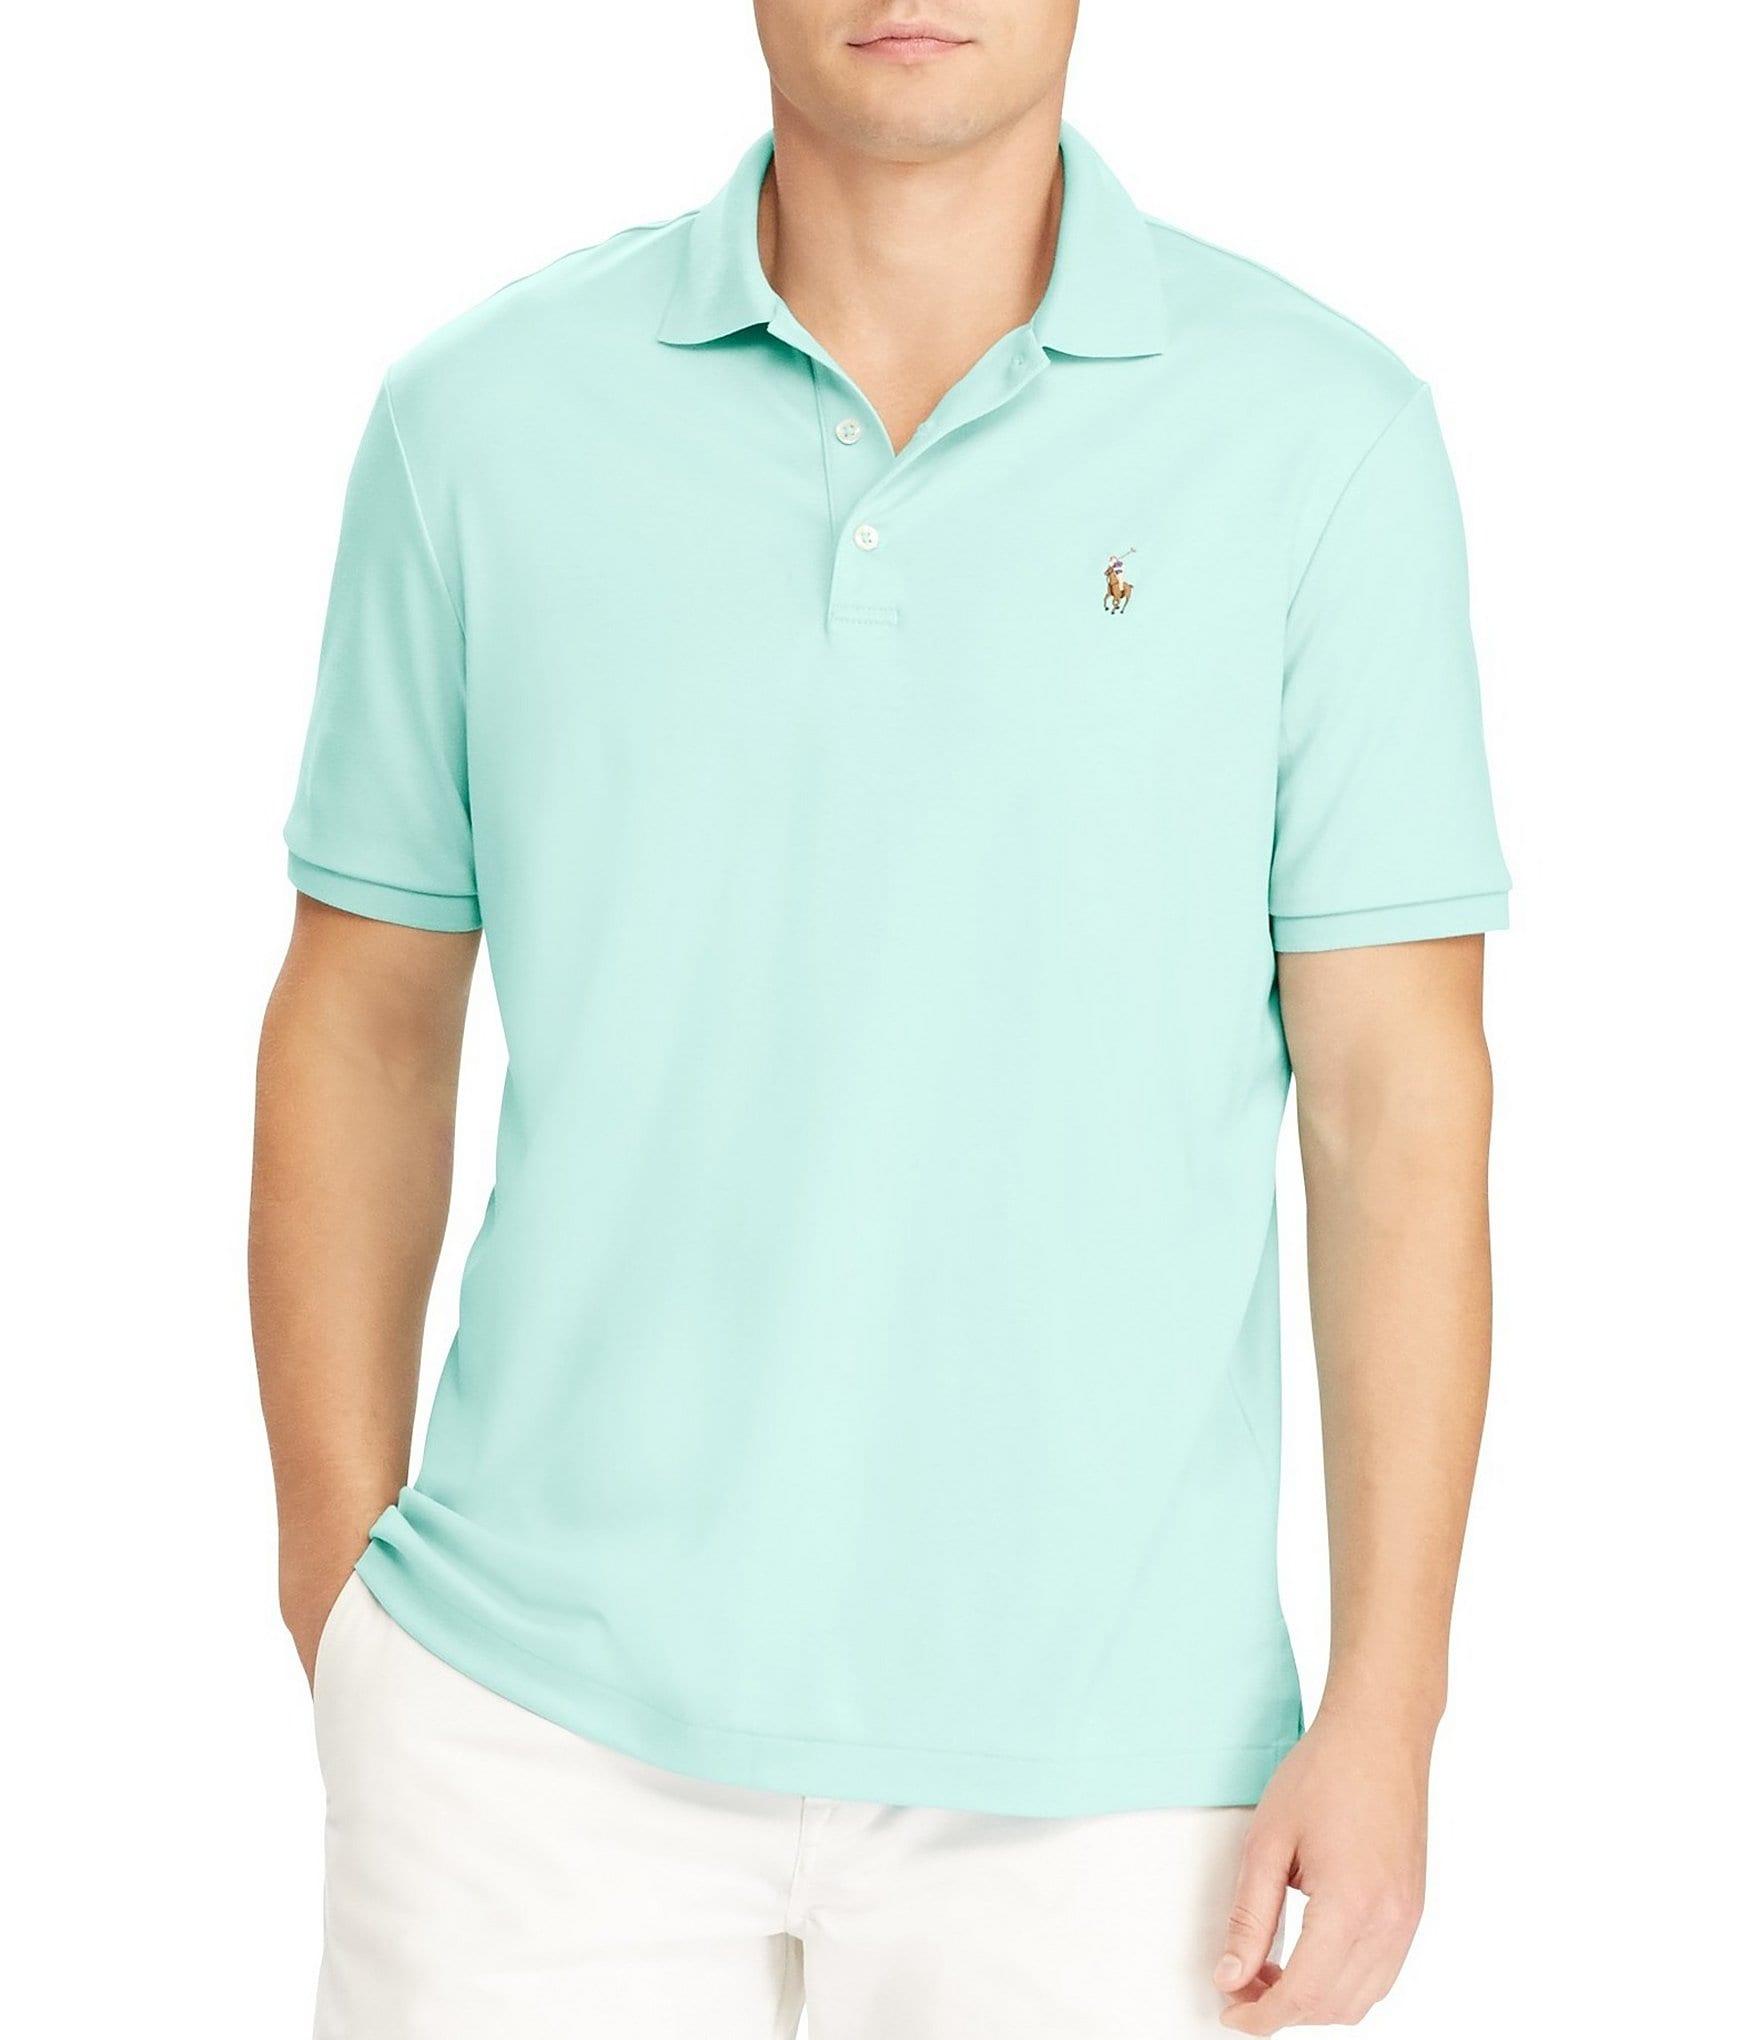 Polo Ralph Lauren Classic Fit Cotton Soft Short Sleeve